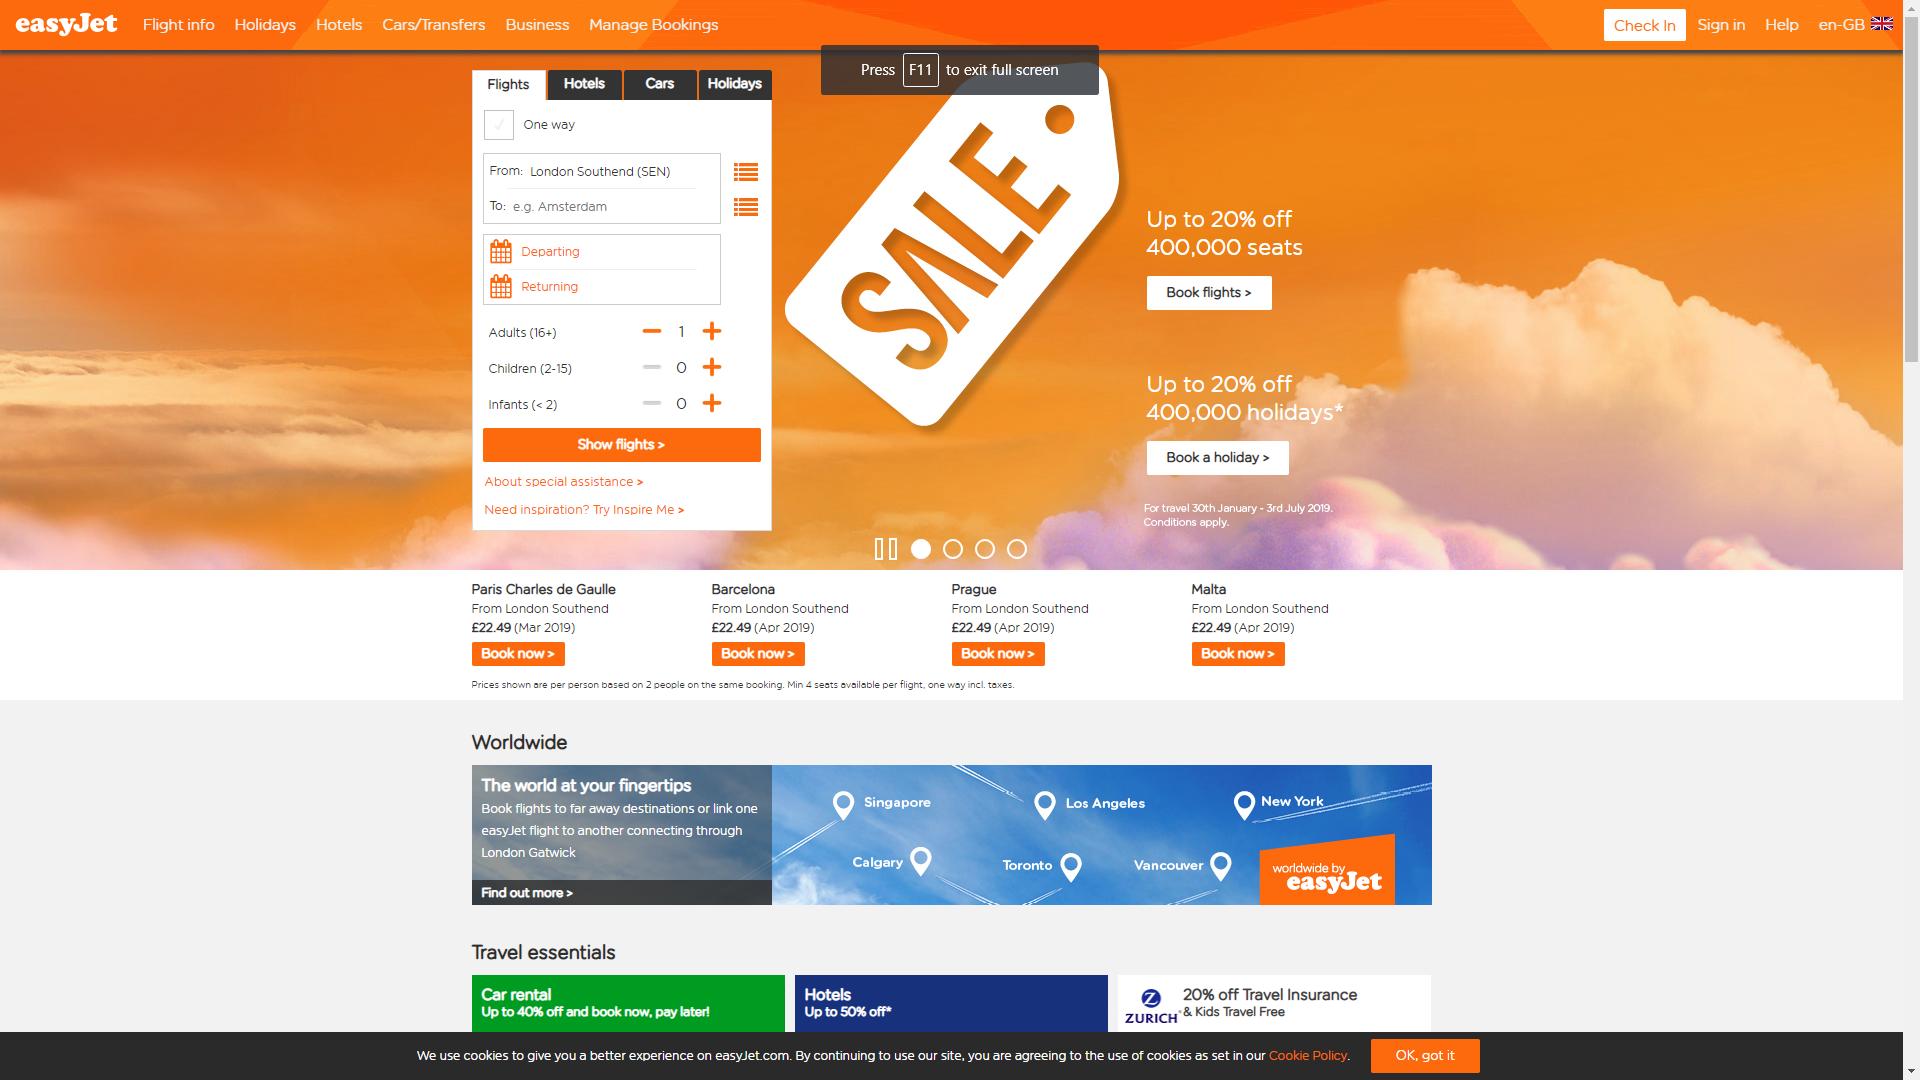 easyJet Home Page